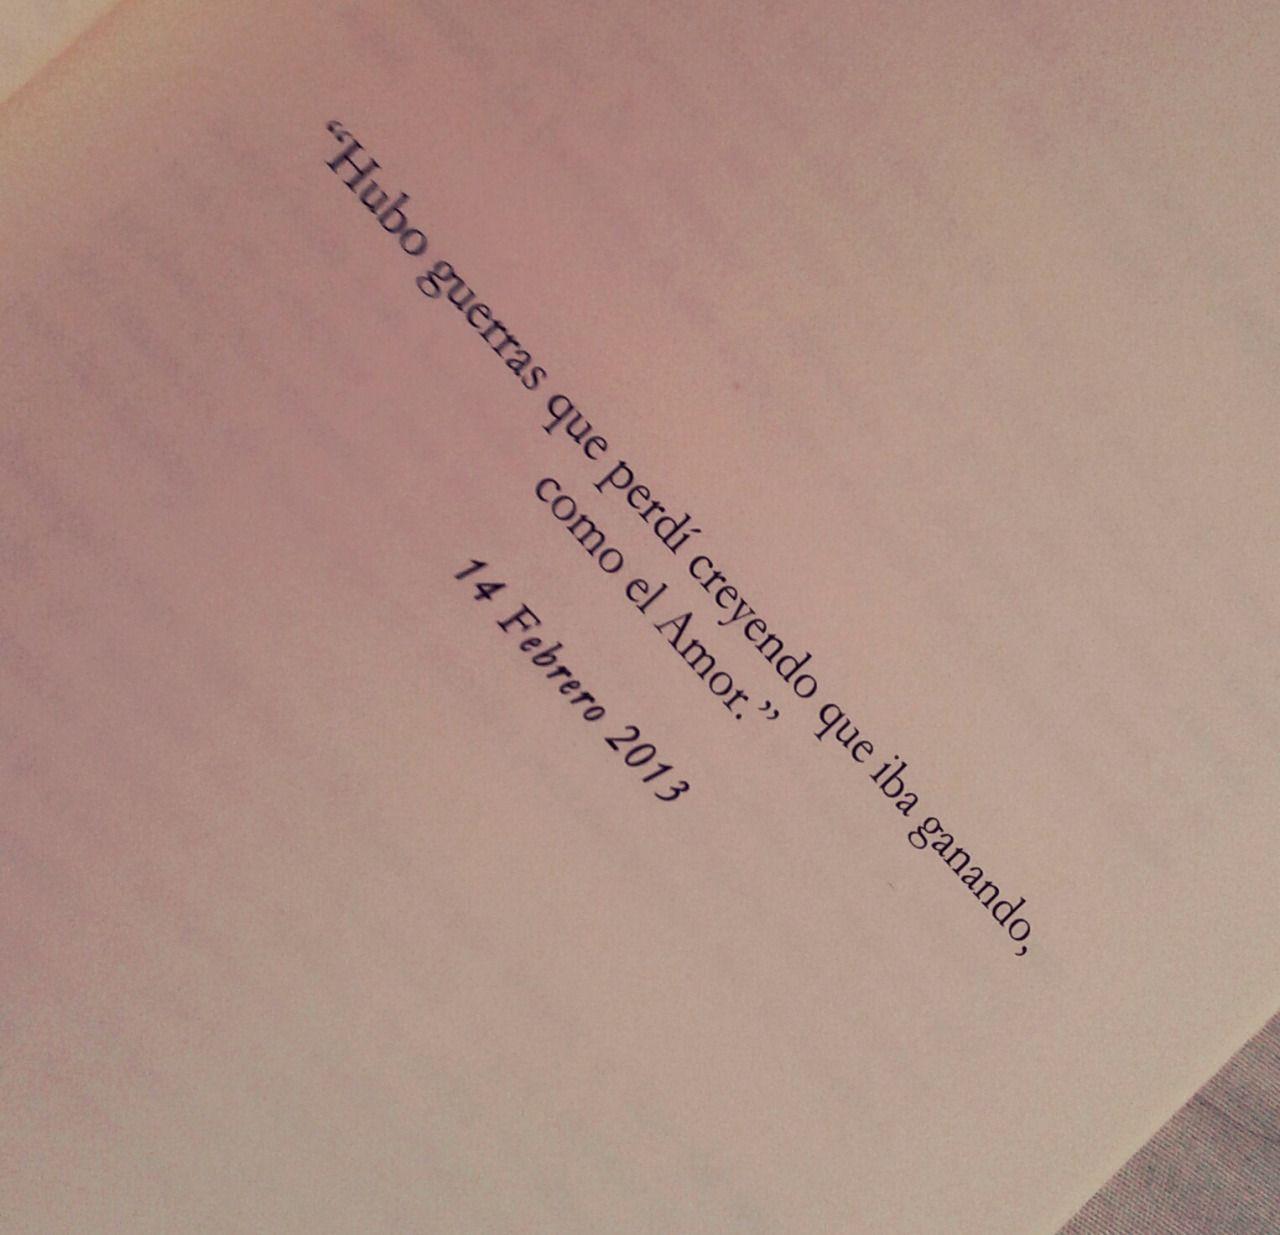 Nuevo Frases De Amor Libros Tumblr Mejor Casa Sobre Frases De Amor